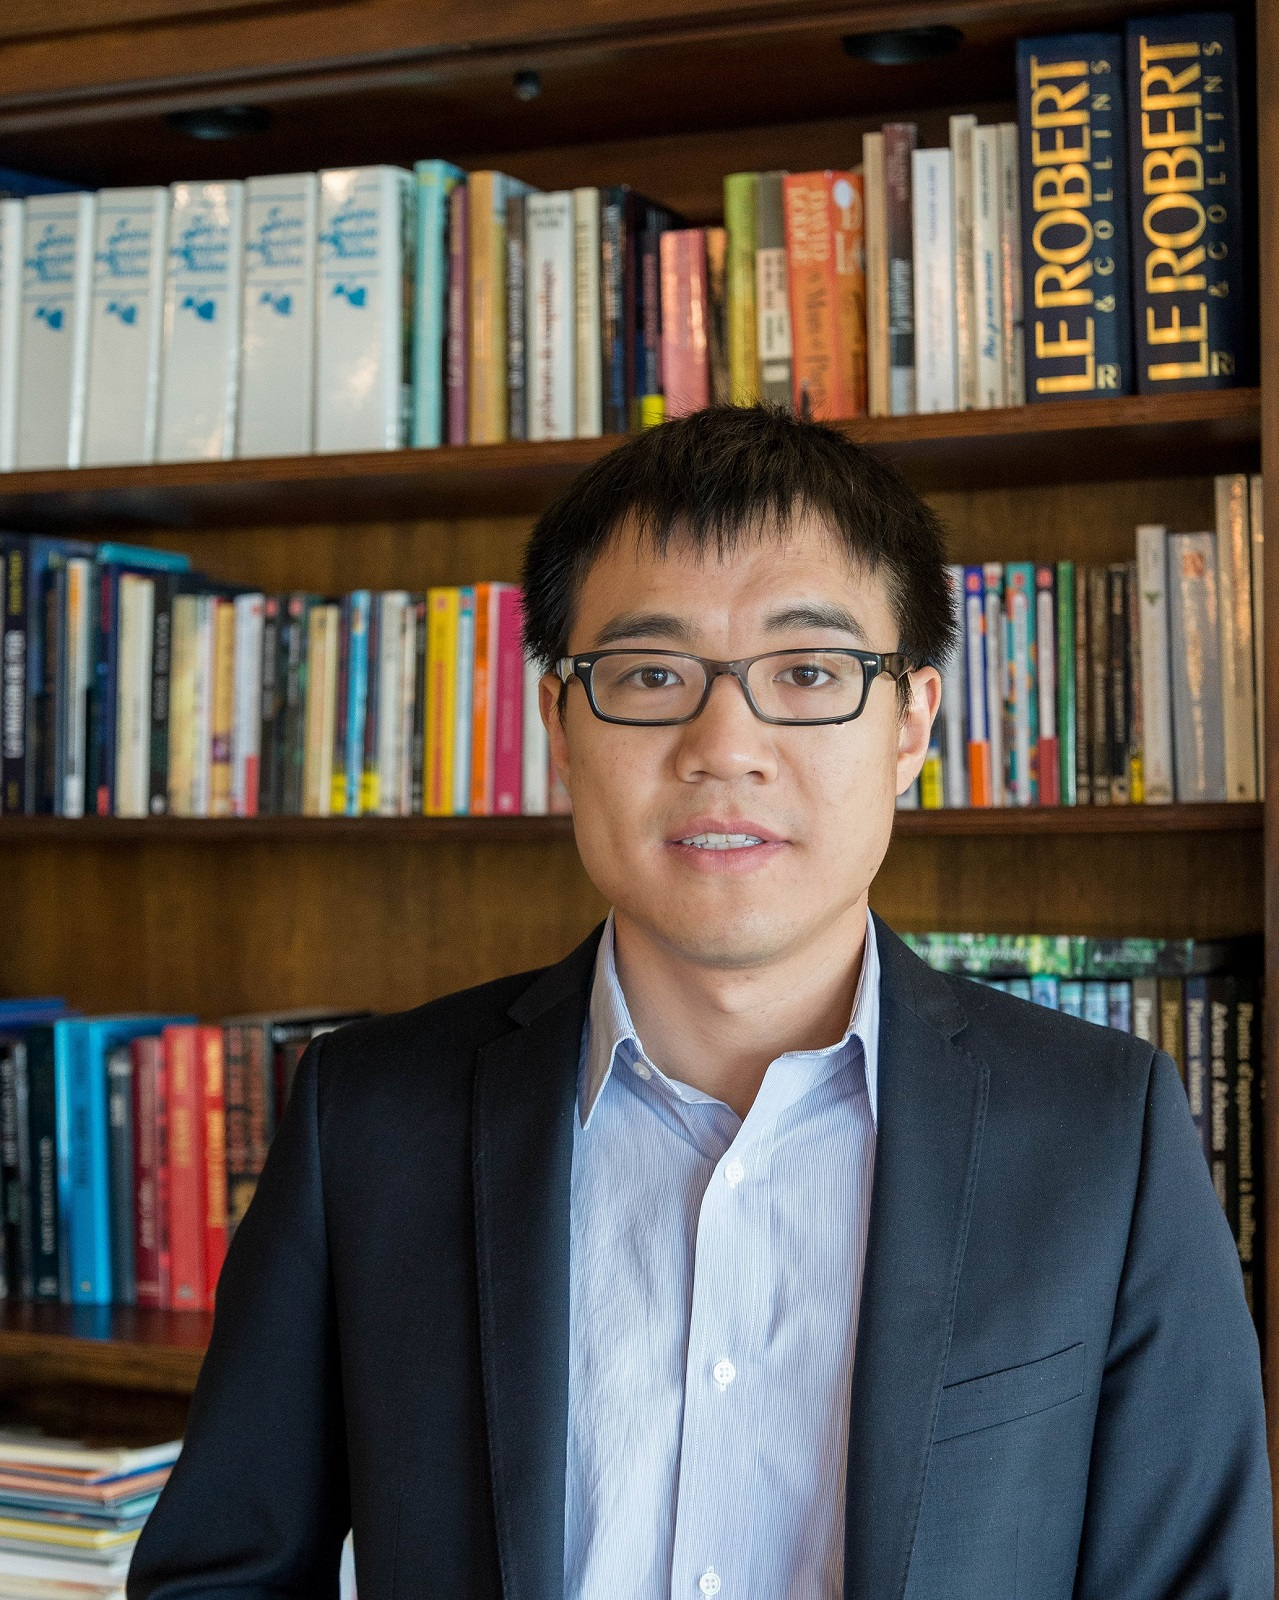 profile image for Linghang Zeng